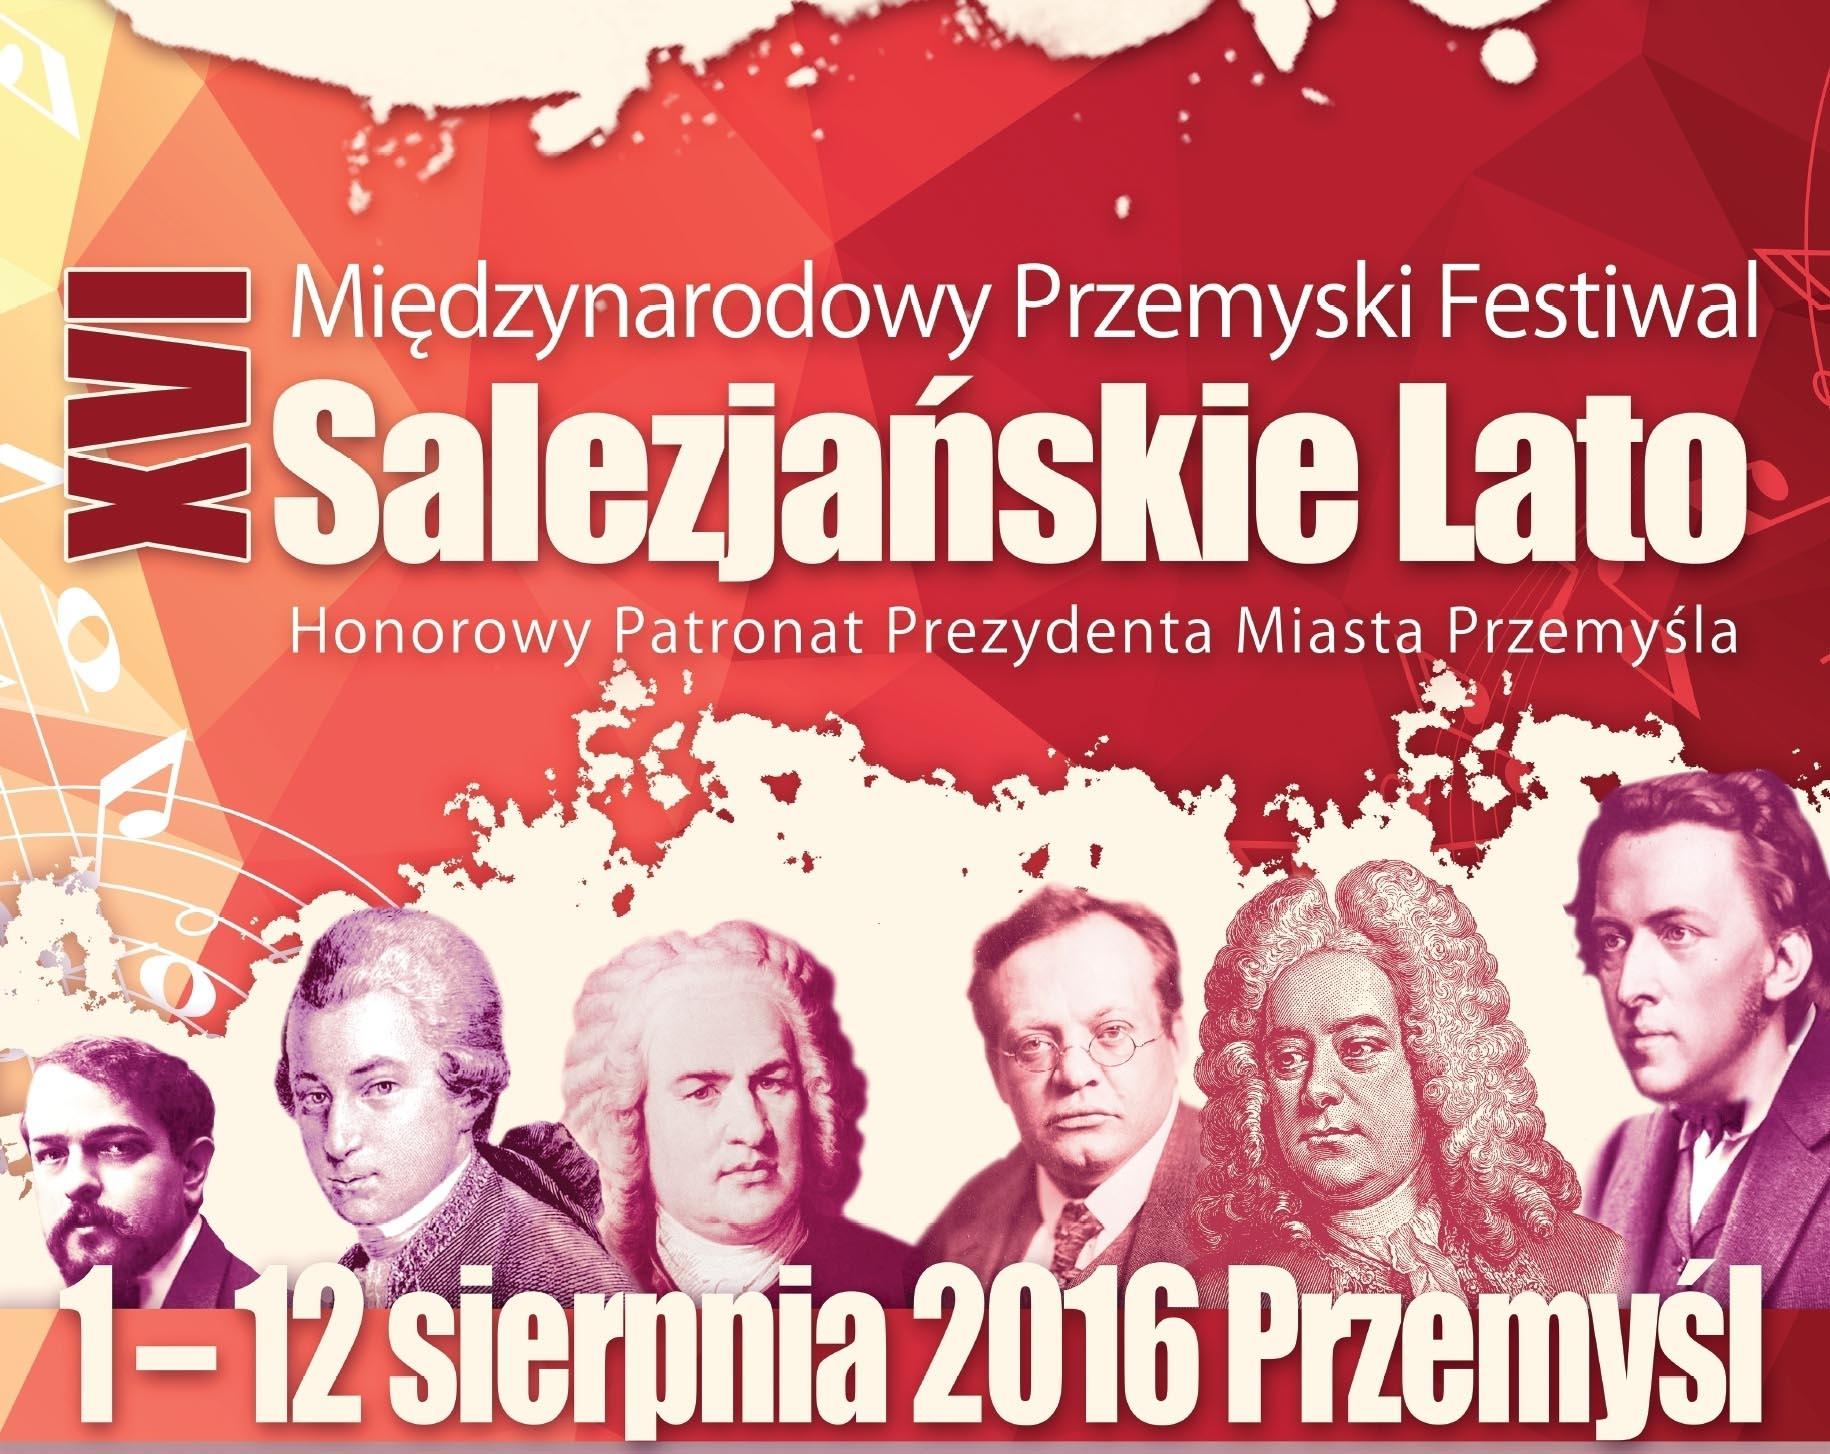 plakat Salezjanskie Lato 2016m.jpeg